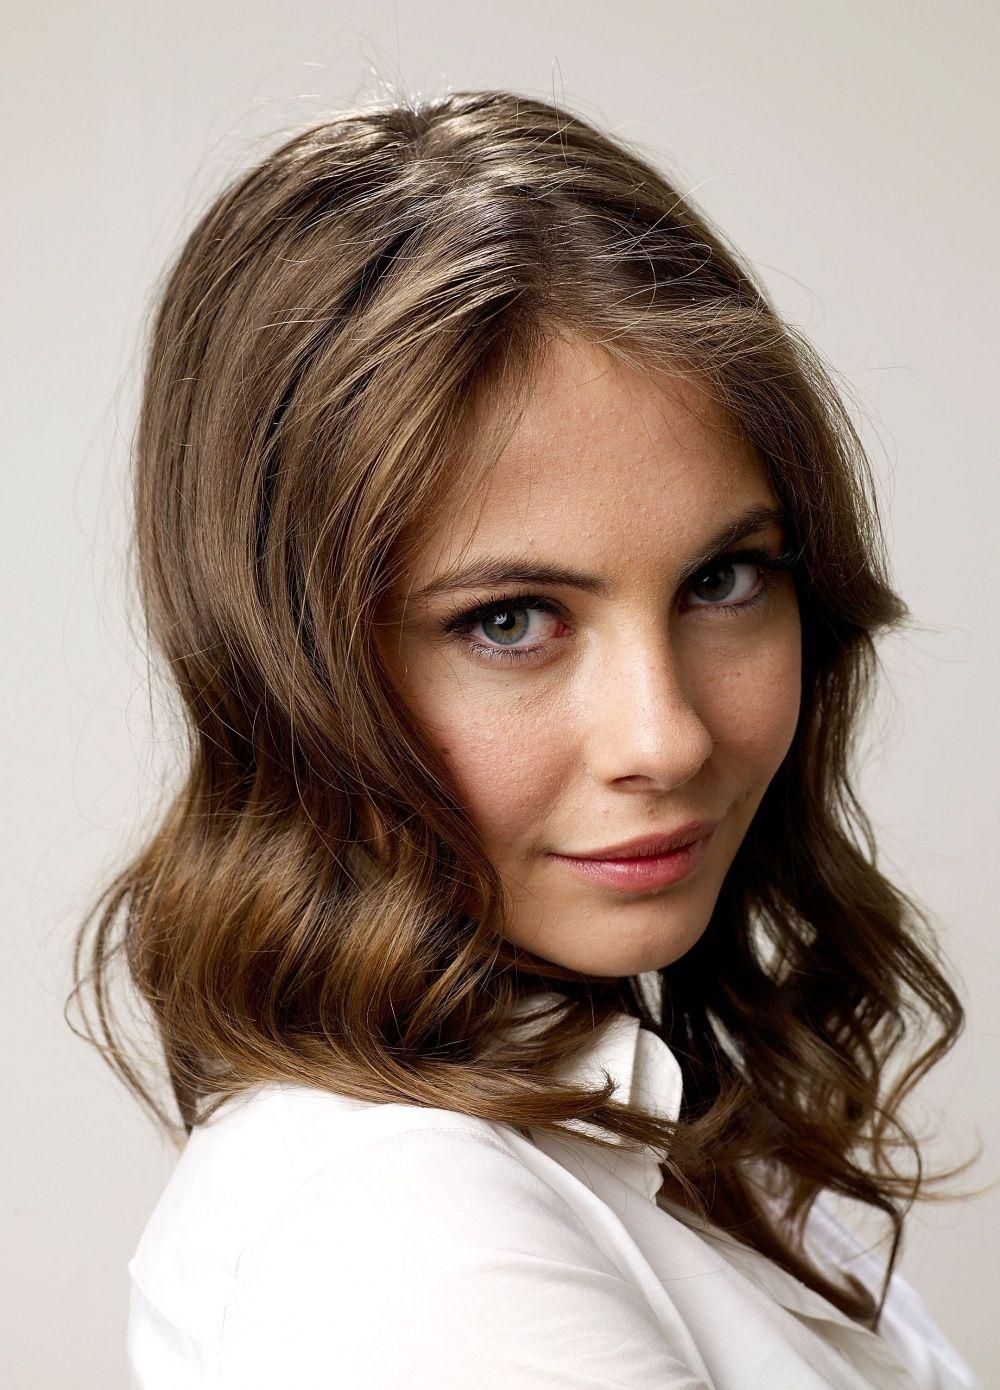 Is a cute Willa Holland